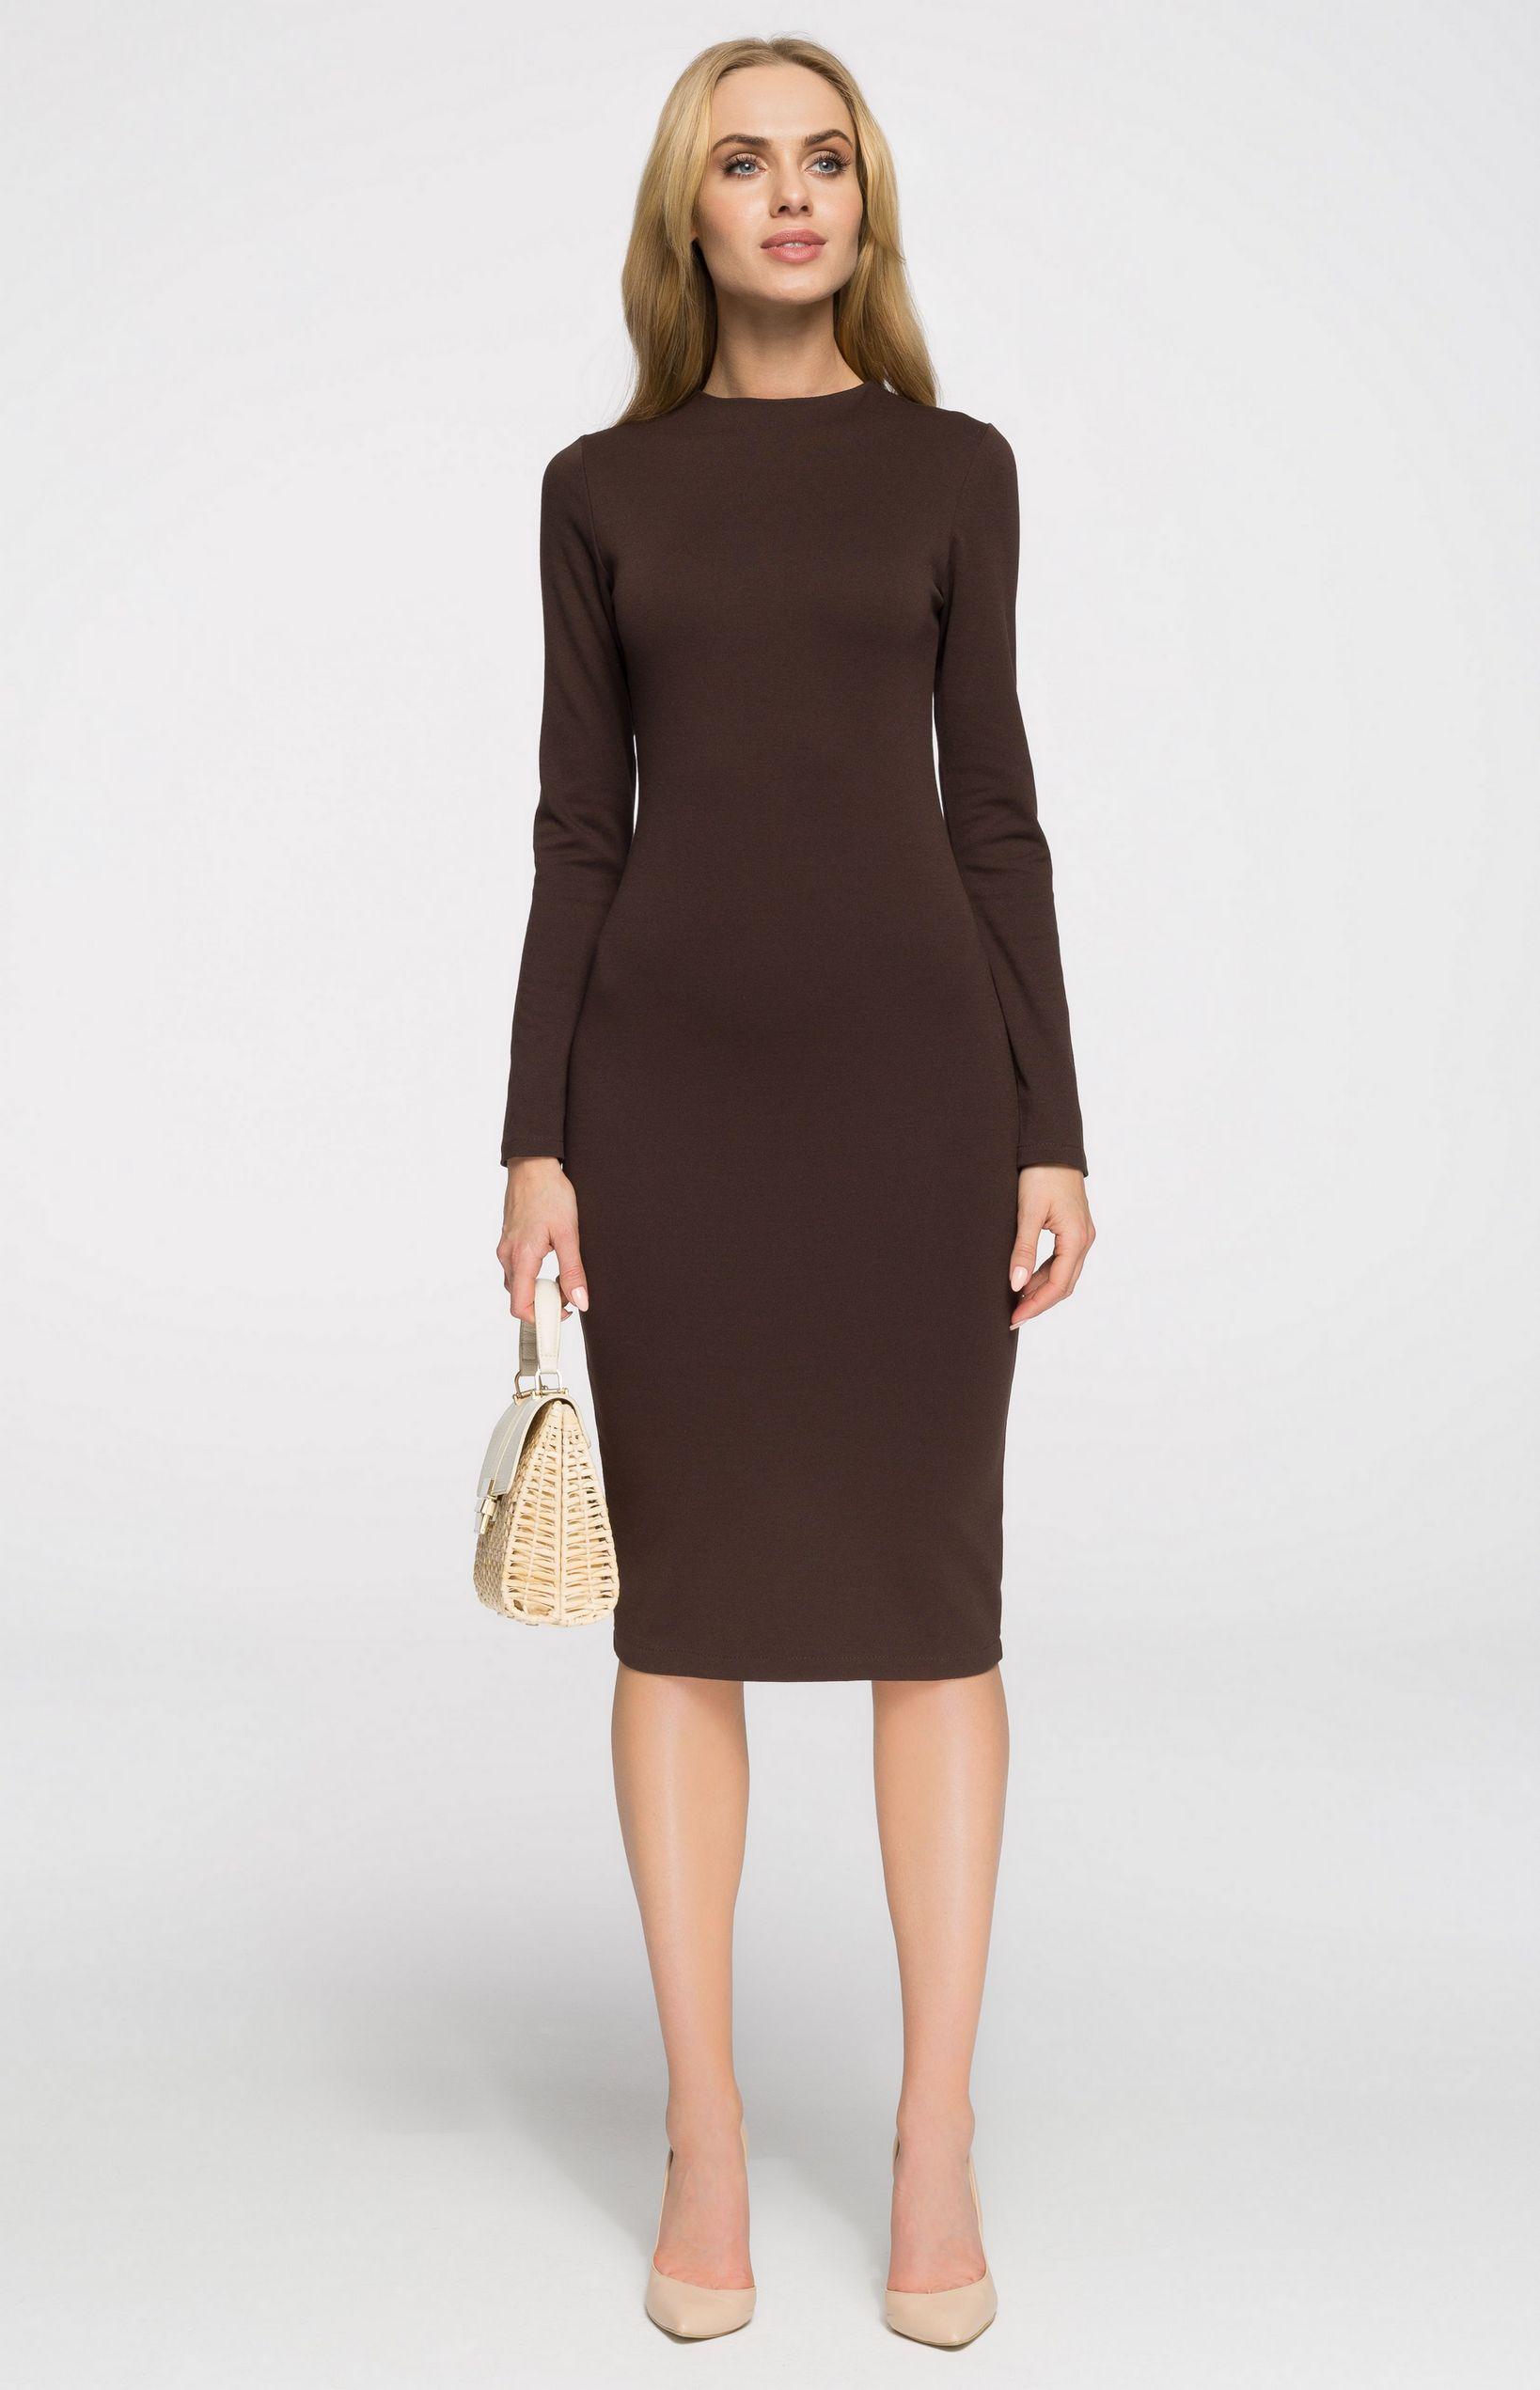 b99cab703ad Robe fourreau cosy marron Style S033M   idresstocode  boutique de ...